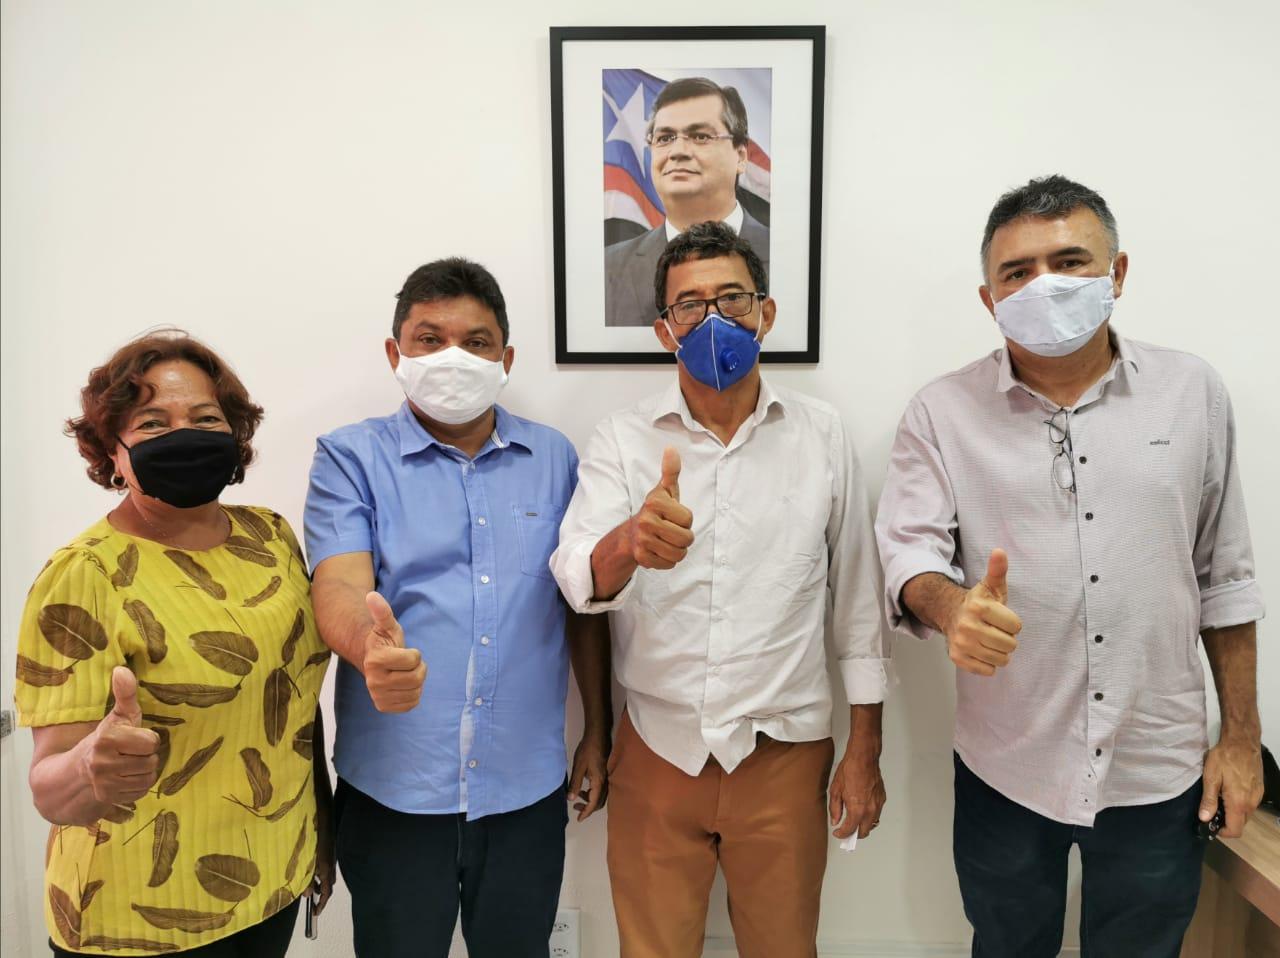 Zezé Nunes, Márcio Jerry, Enoc Lopes e Mávio Rocha